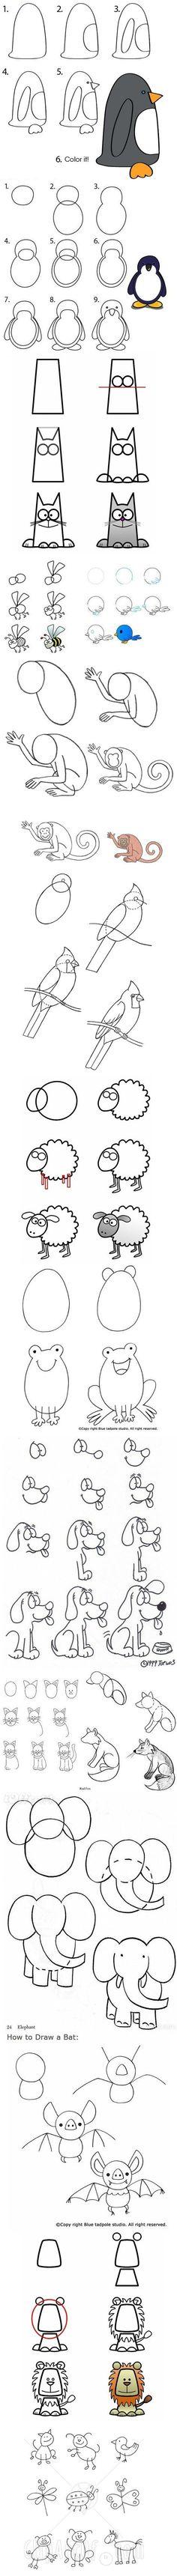 How to draw animals #kids #easy #cute #cartoon